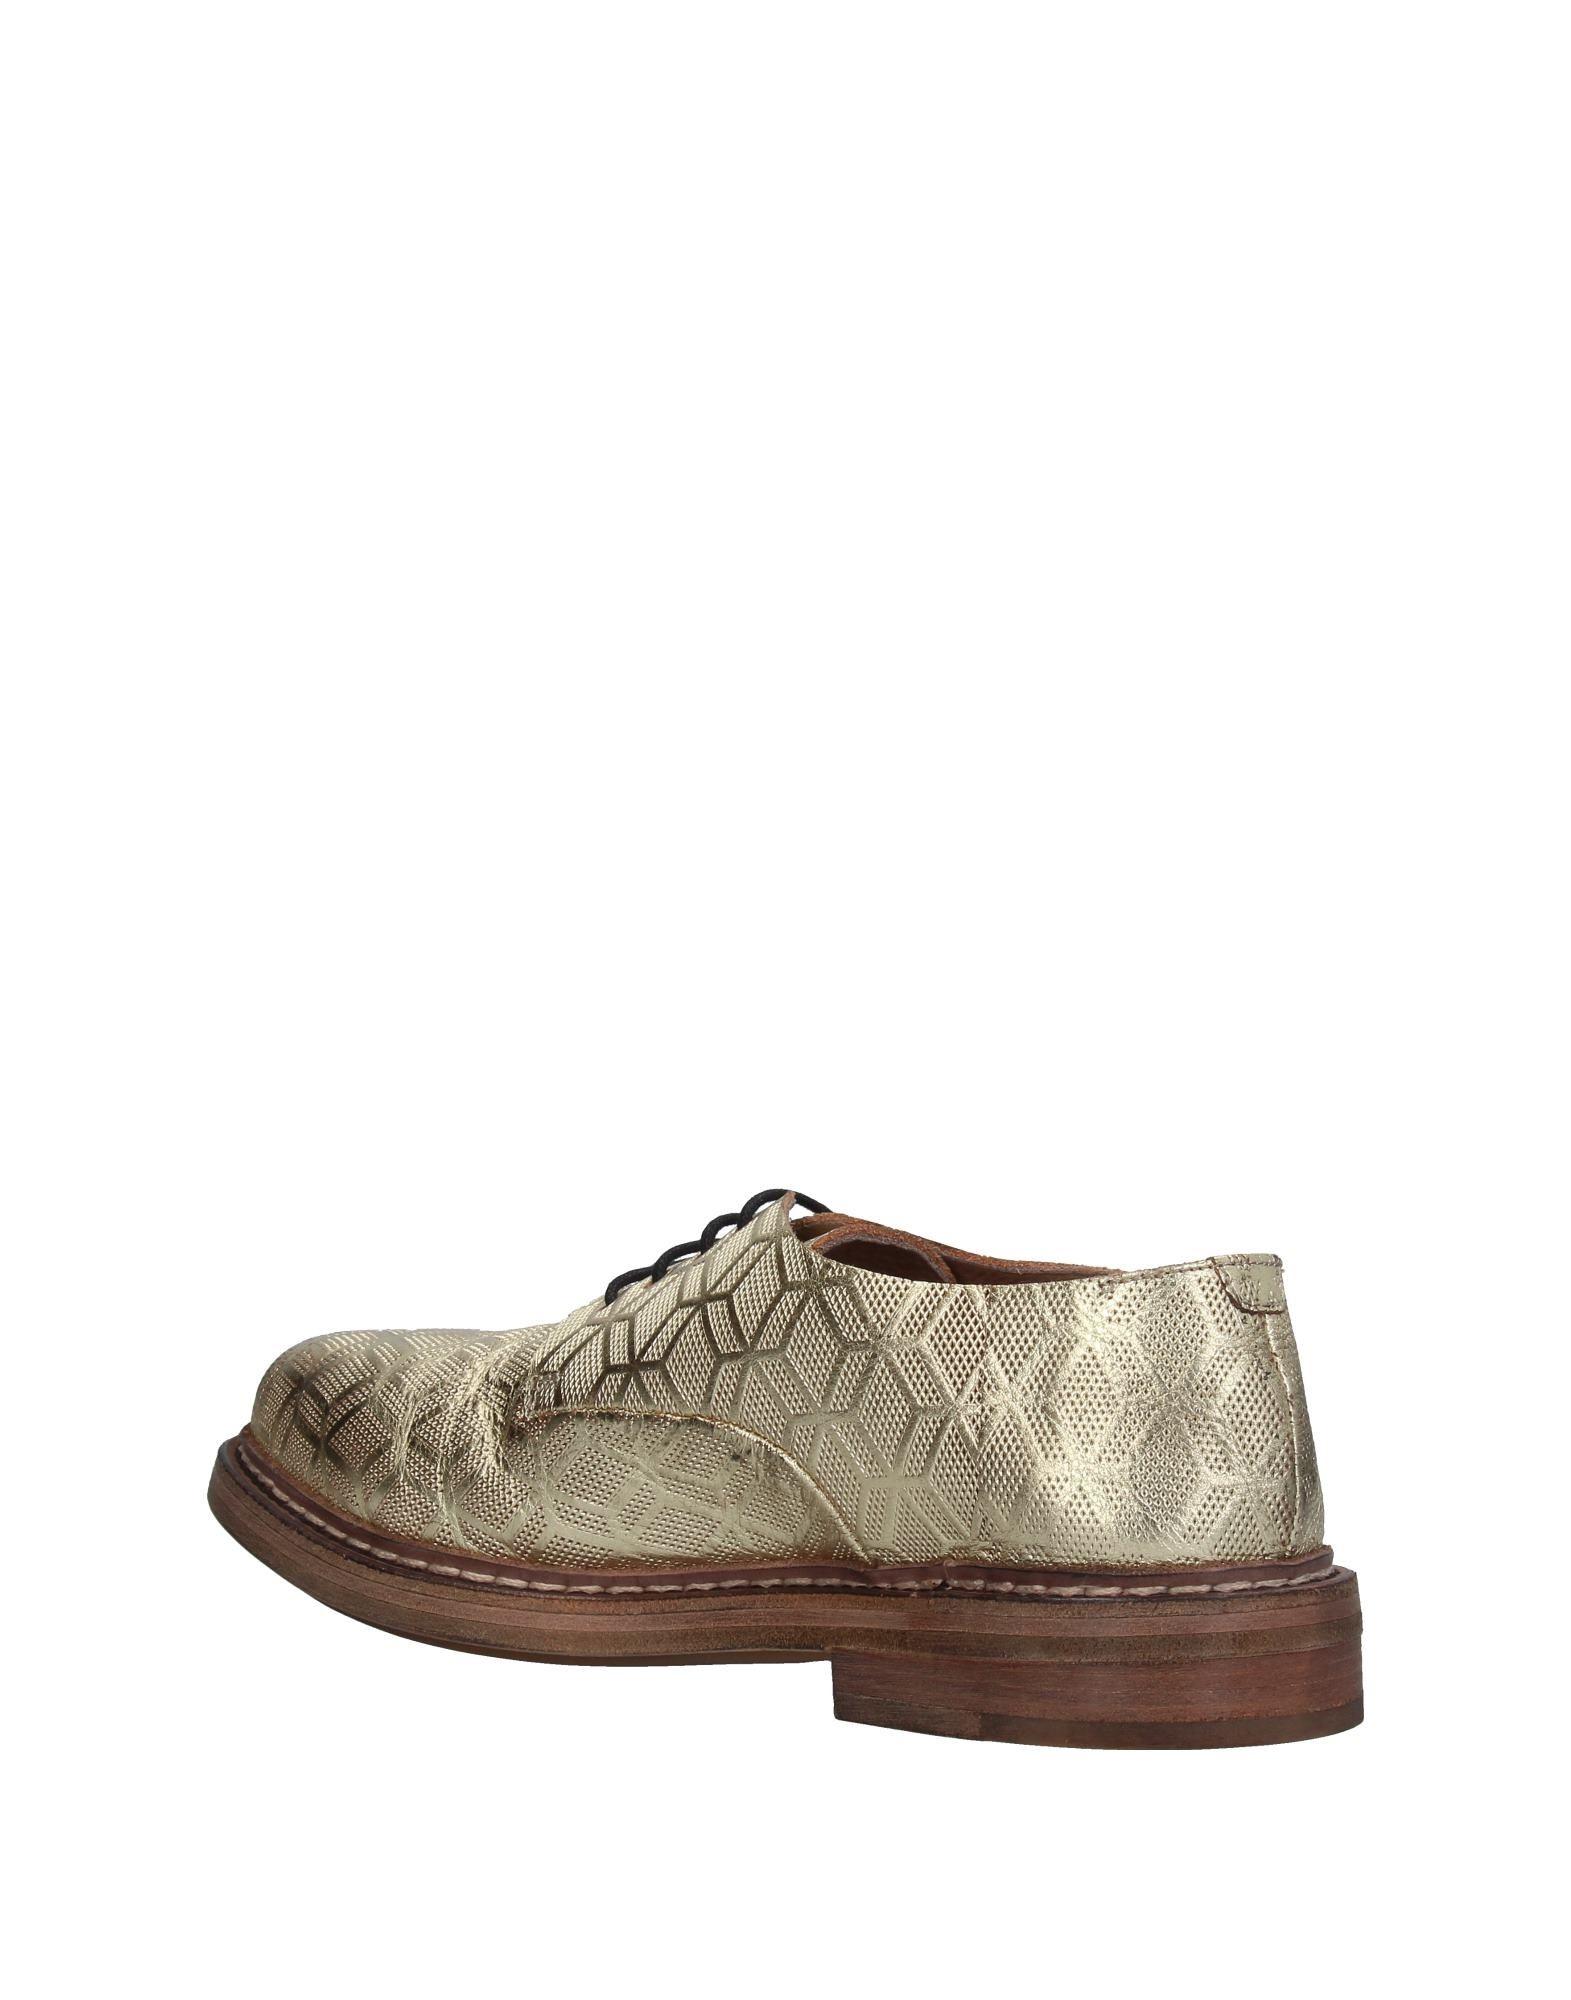 CHAUSSURES - MocassinsIntrigo Shoes 4uQmP7